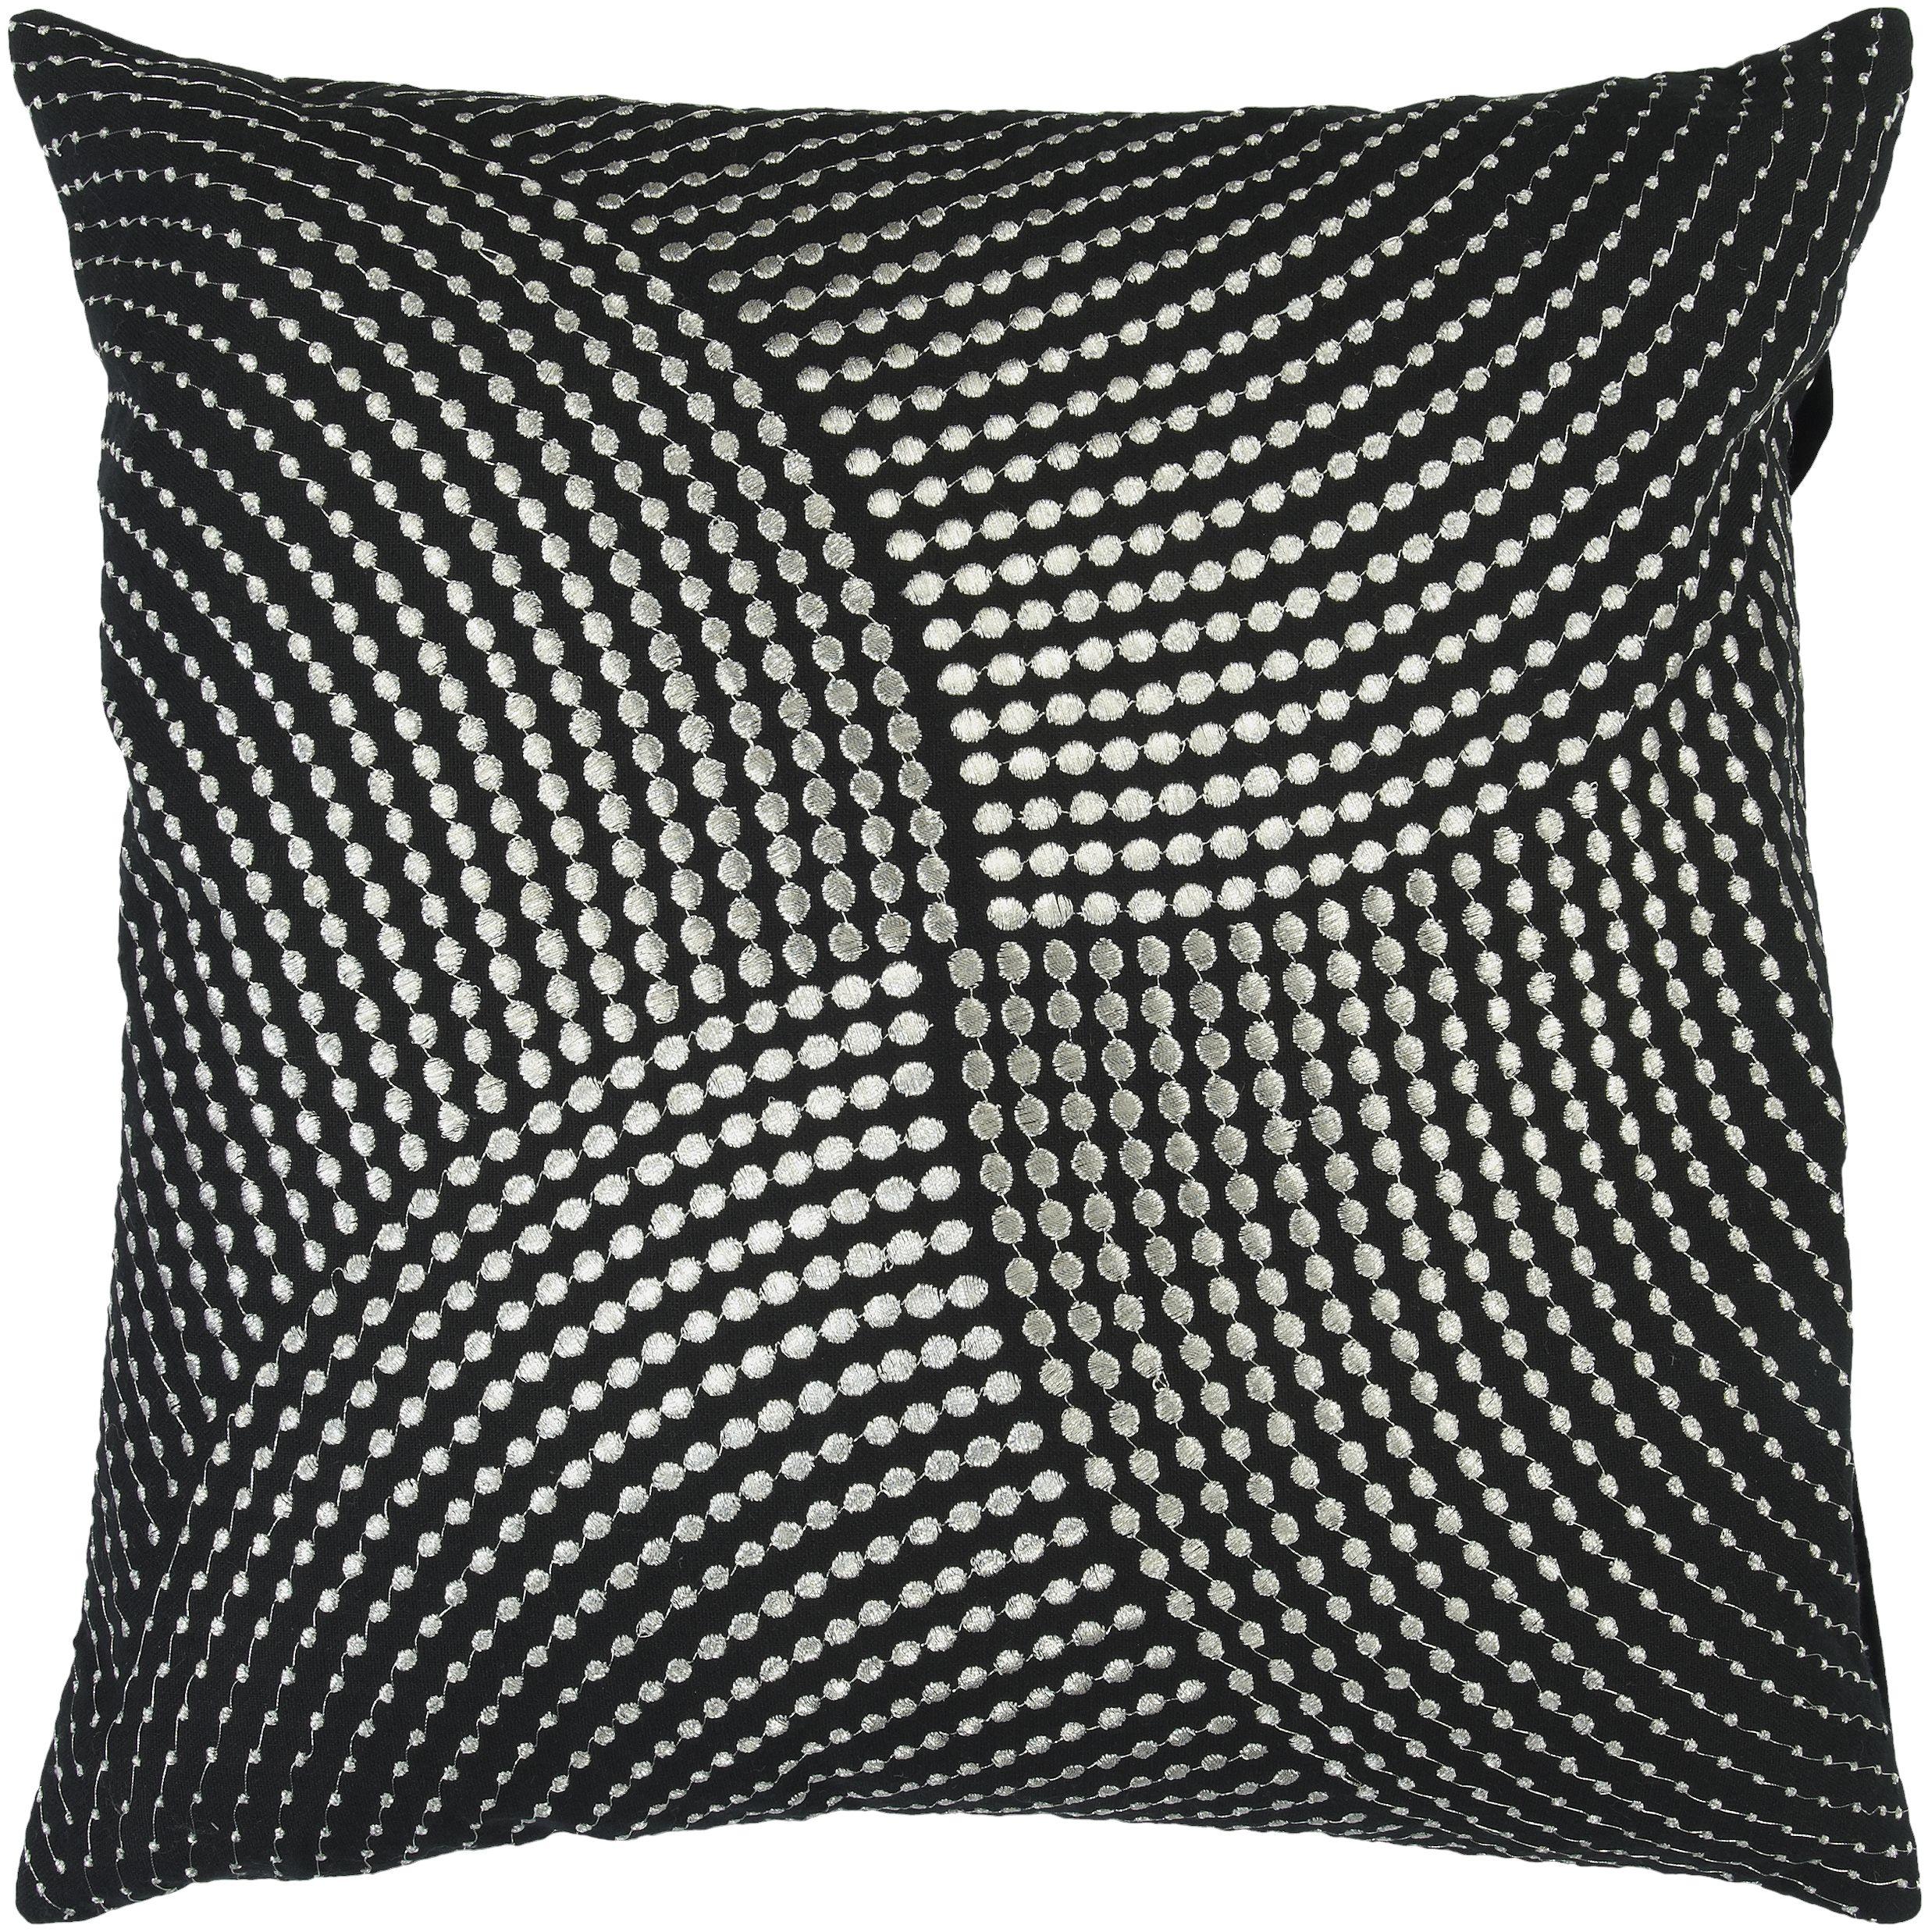 Midnight Black Gray Poly Cotton Throw Pillow